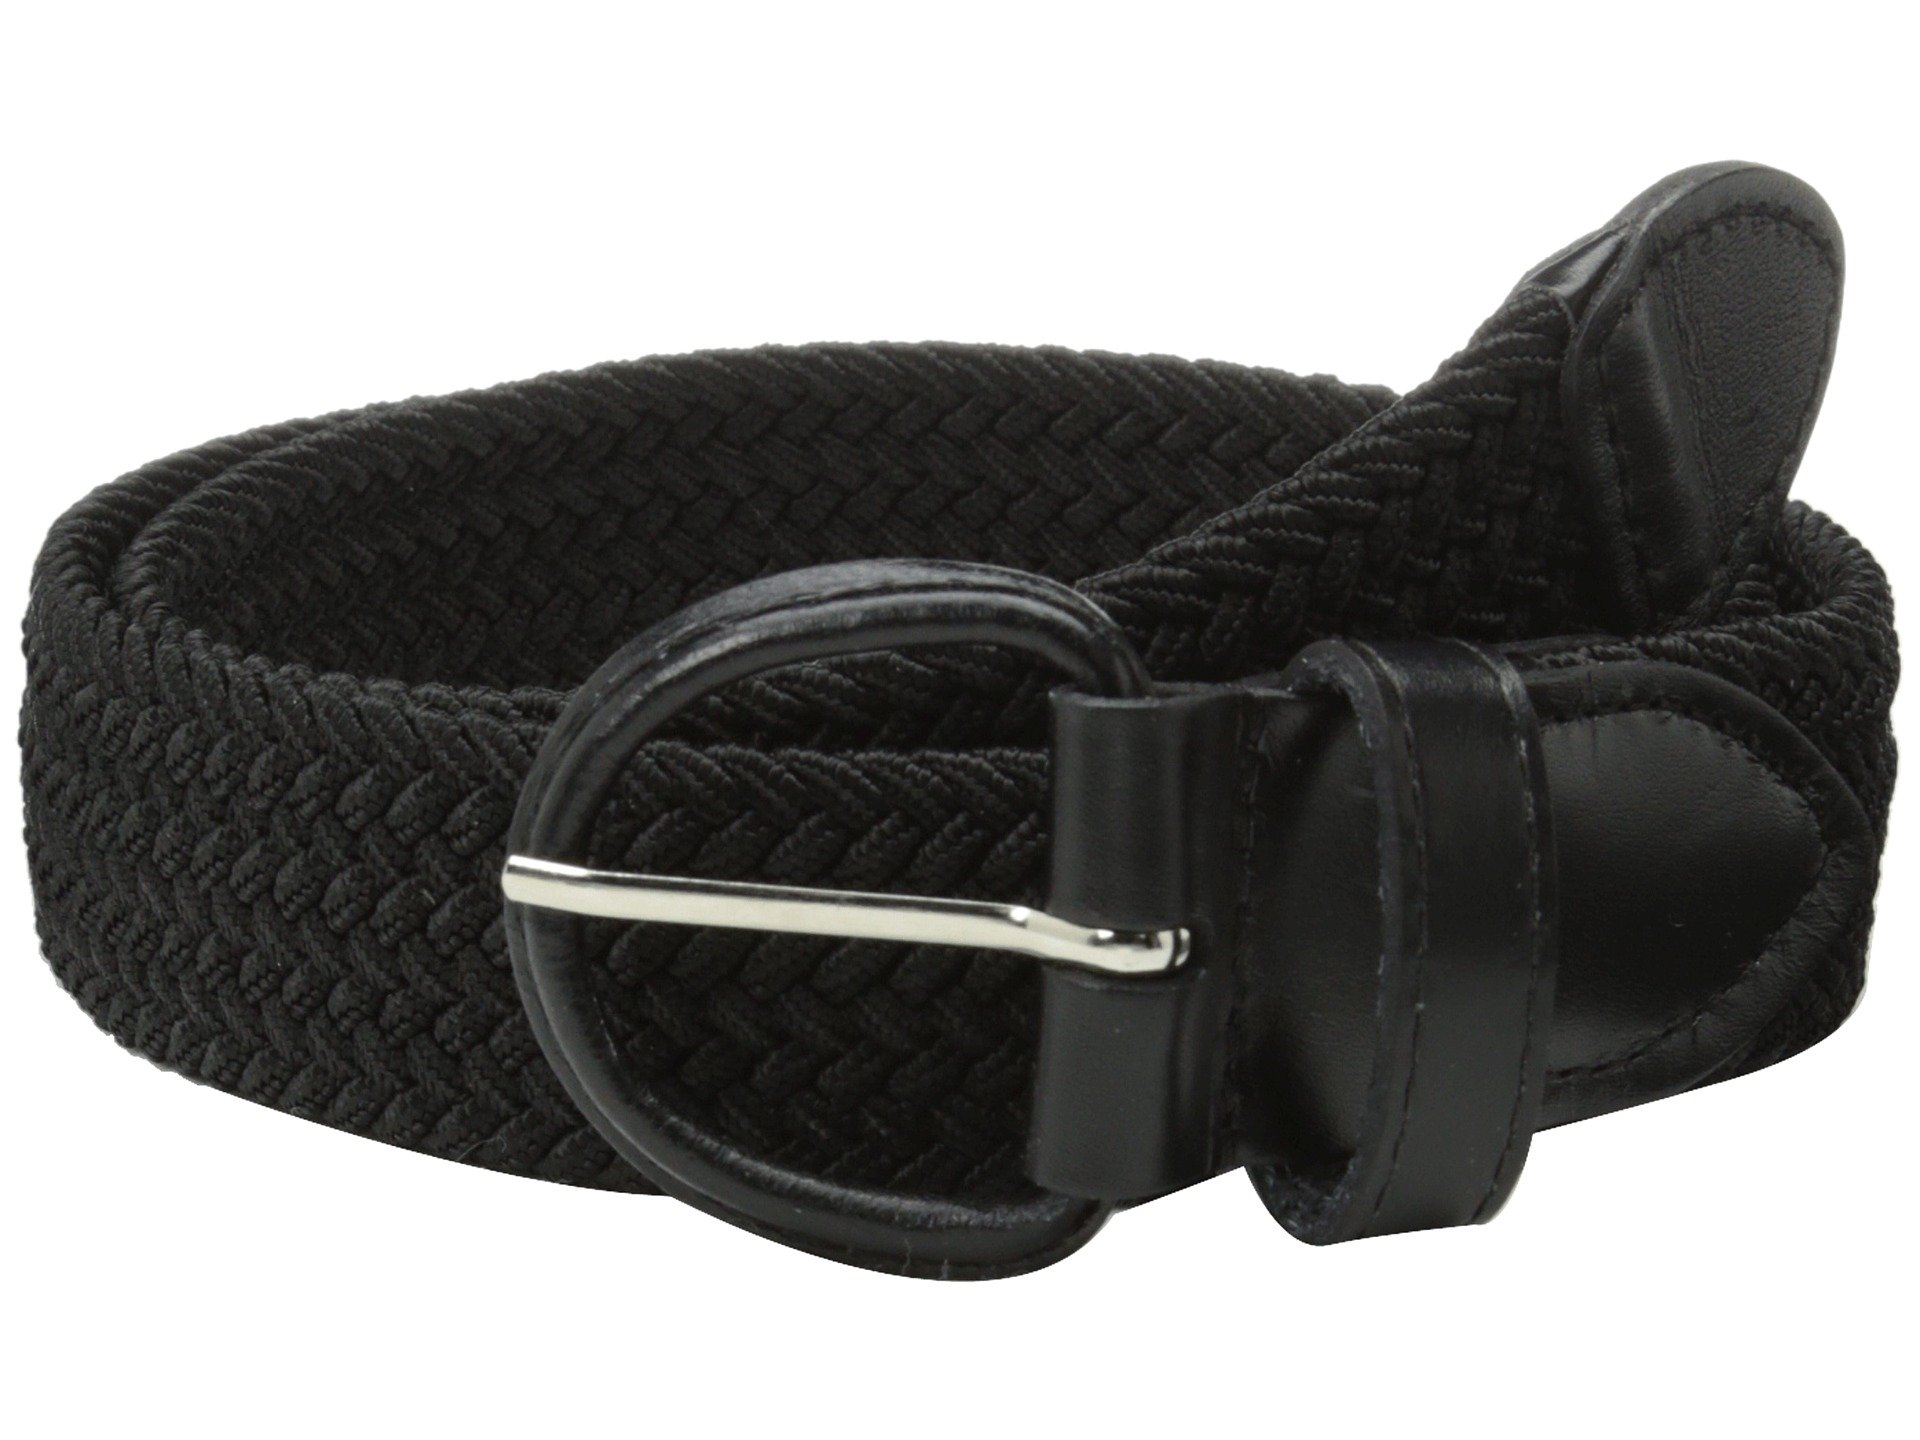 Correa o Cinturon para Hombre Florsheim Braided Elastic Stretch Belt 35mm  + Florsheim en VeoyCompro.net